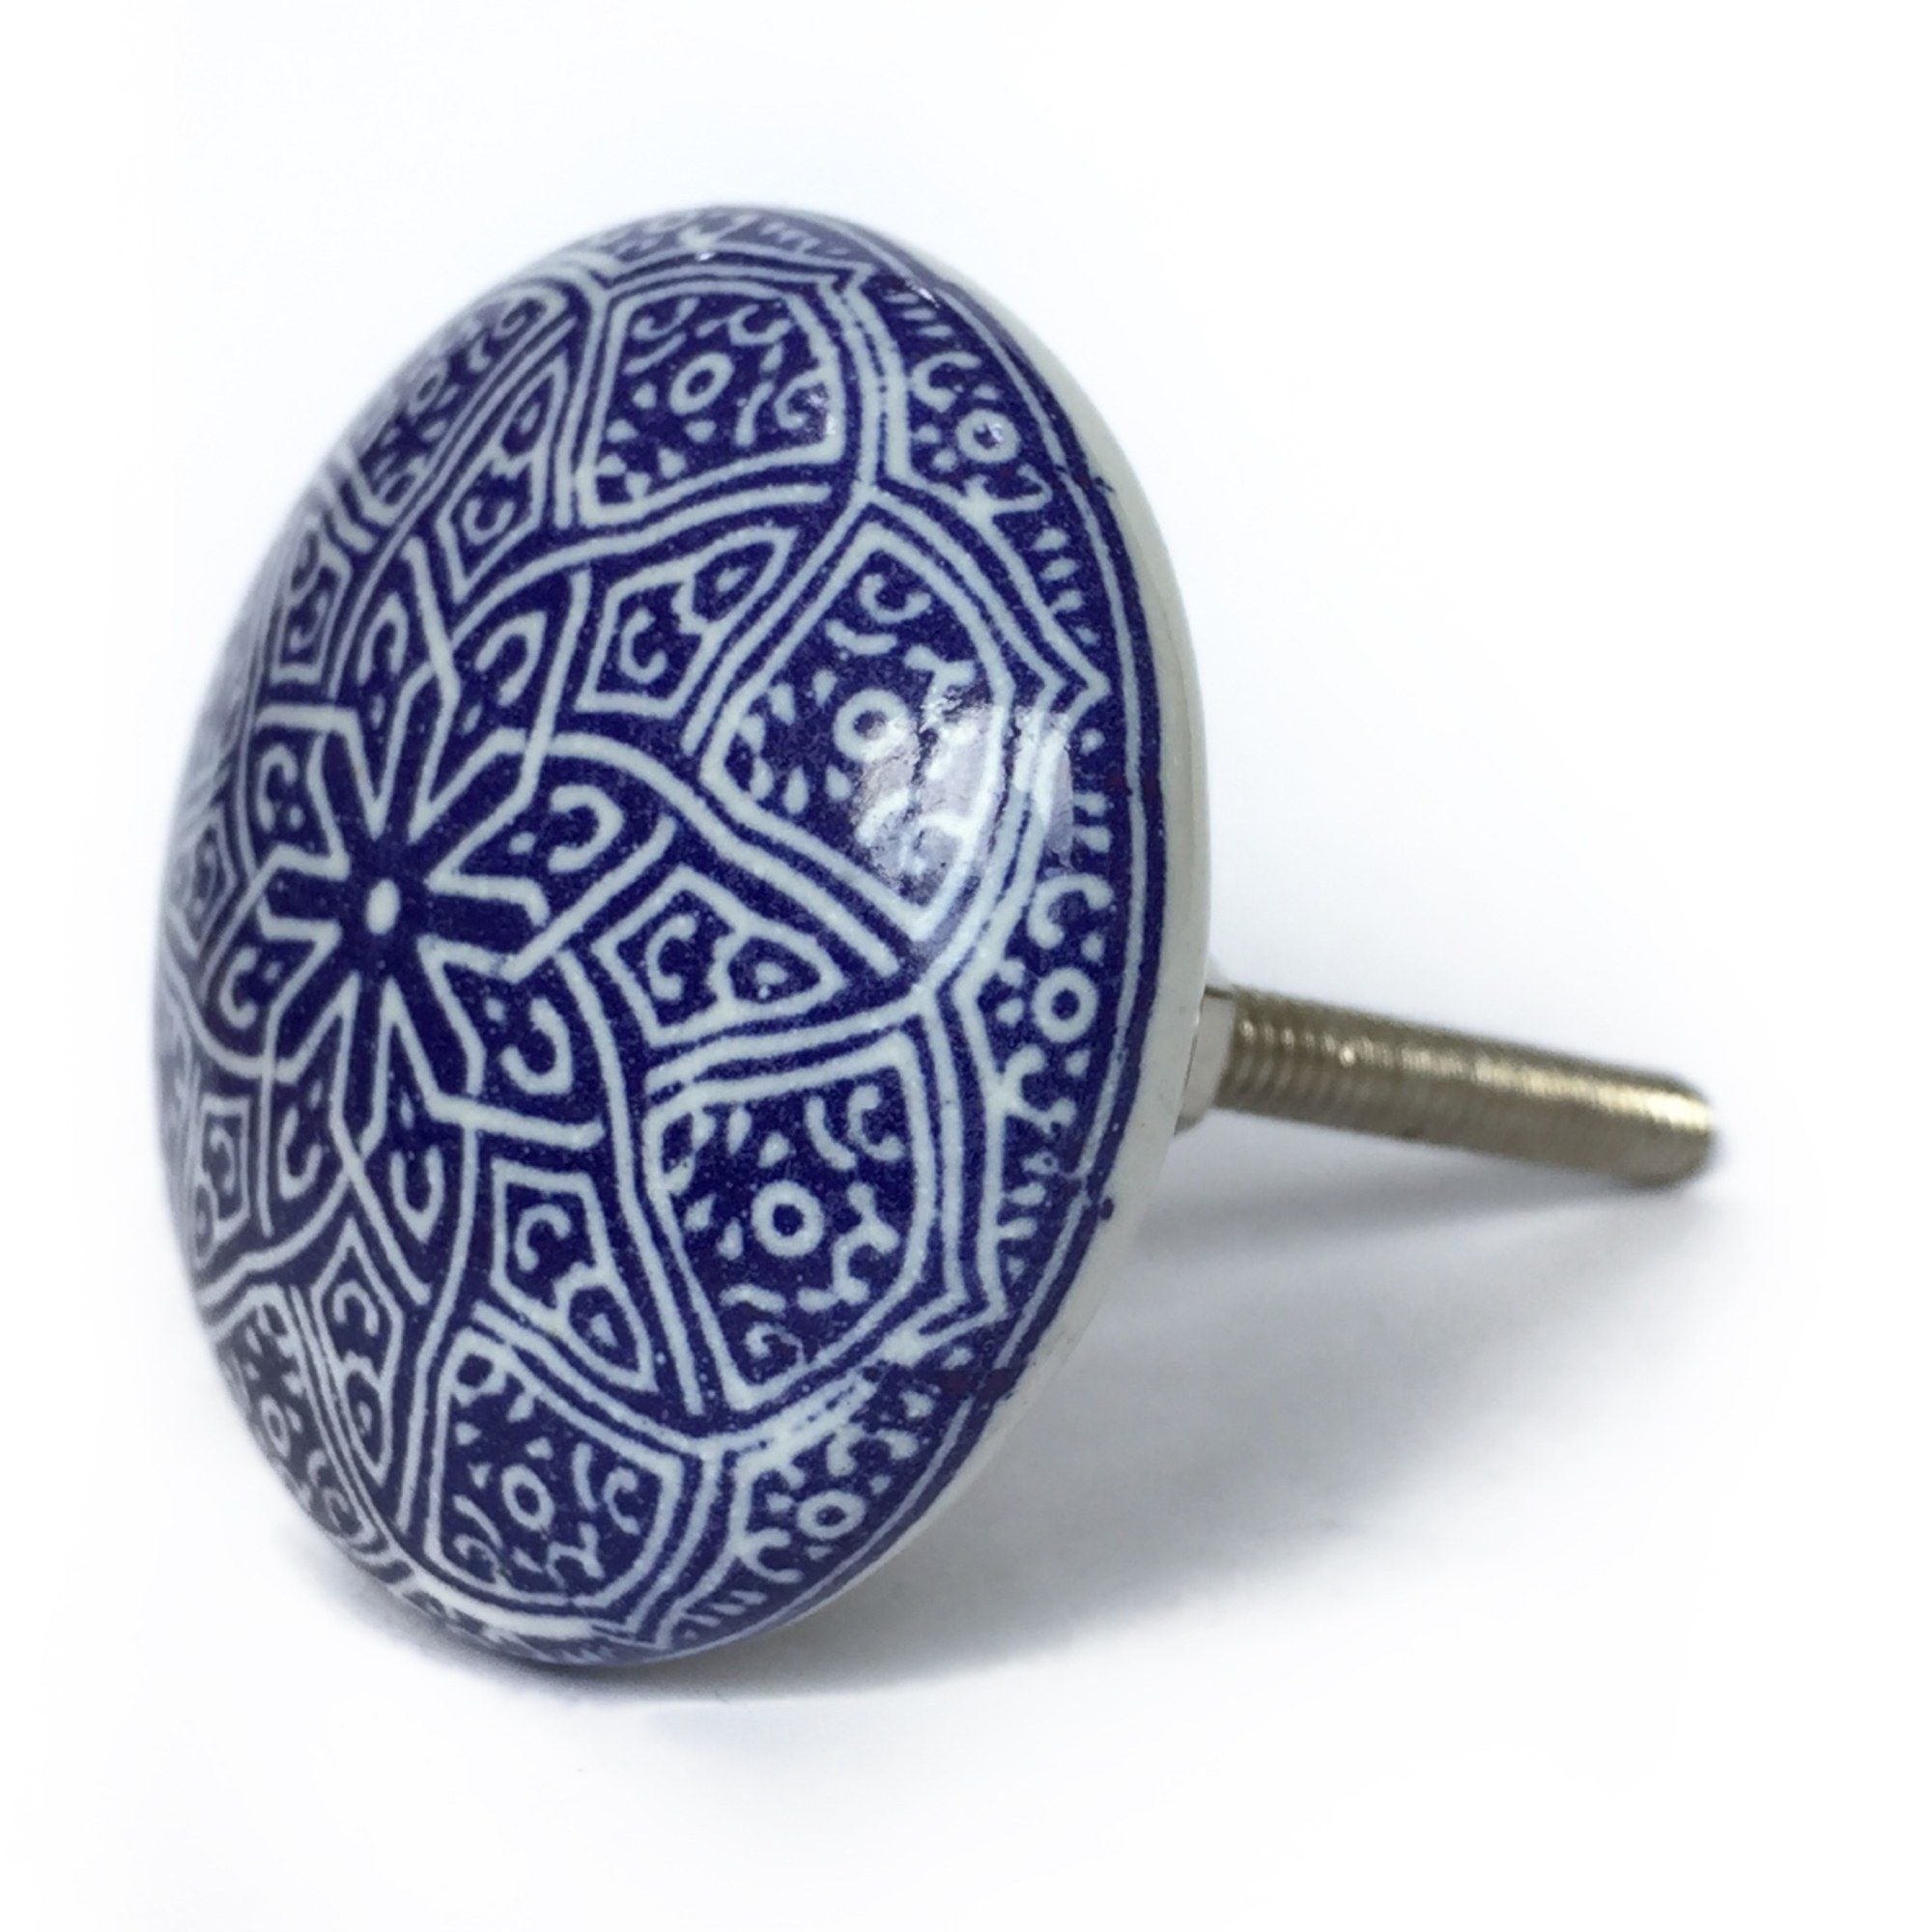 Puxador de Porcelana Decorada Lisboa